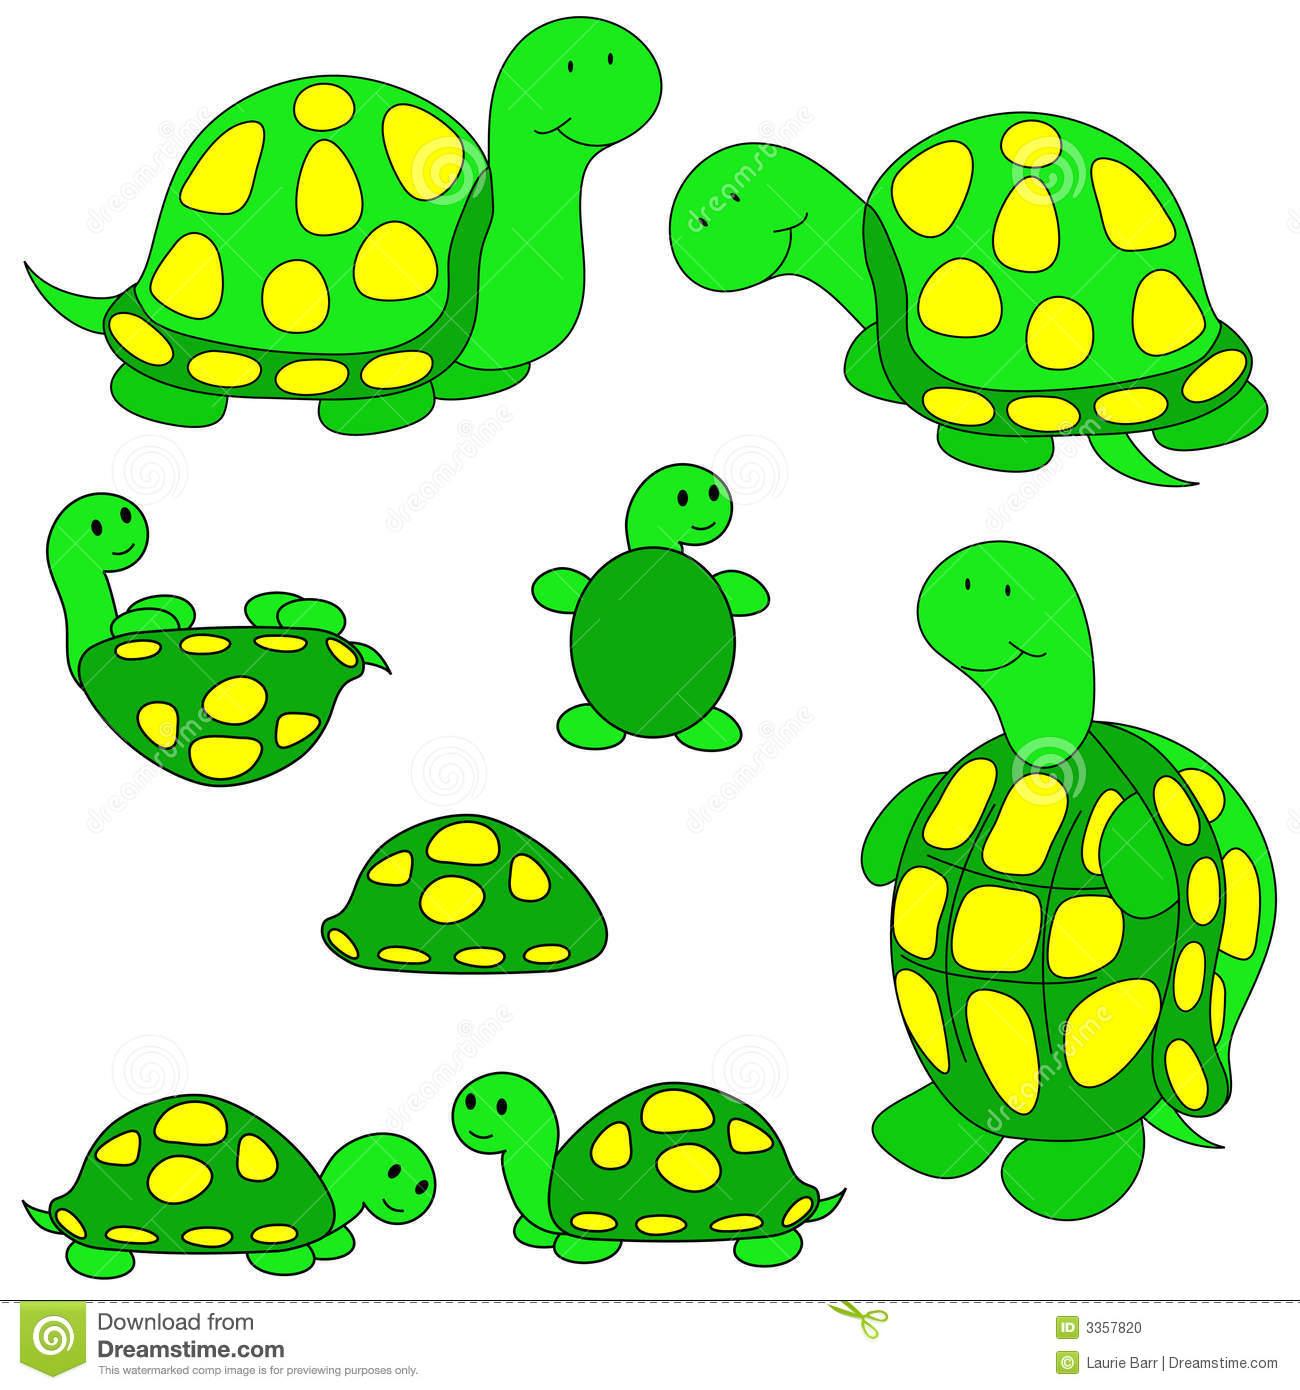 Turtle clipart tiny #11